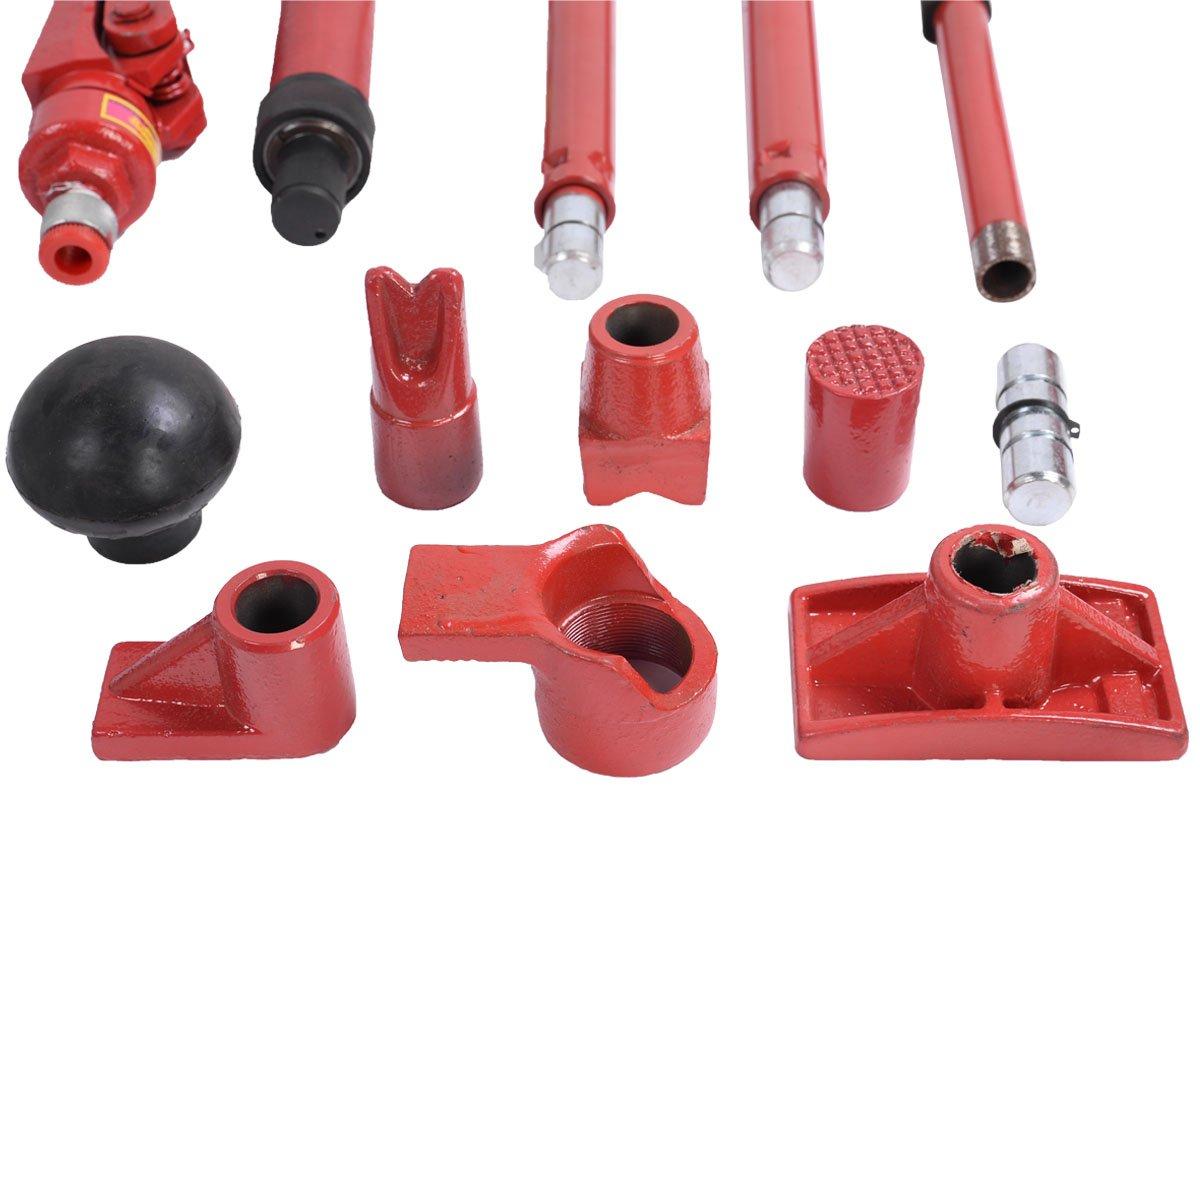 Goplus 4 Ton Porta Power Hydraulic Jack Body Frame Repair Kit Auto Shop Tool Heavy Set w/ Carrying Case by Goplus (Image #4)